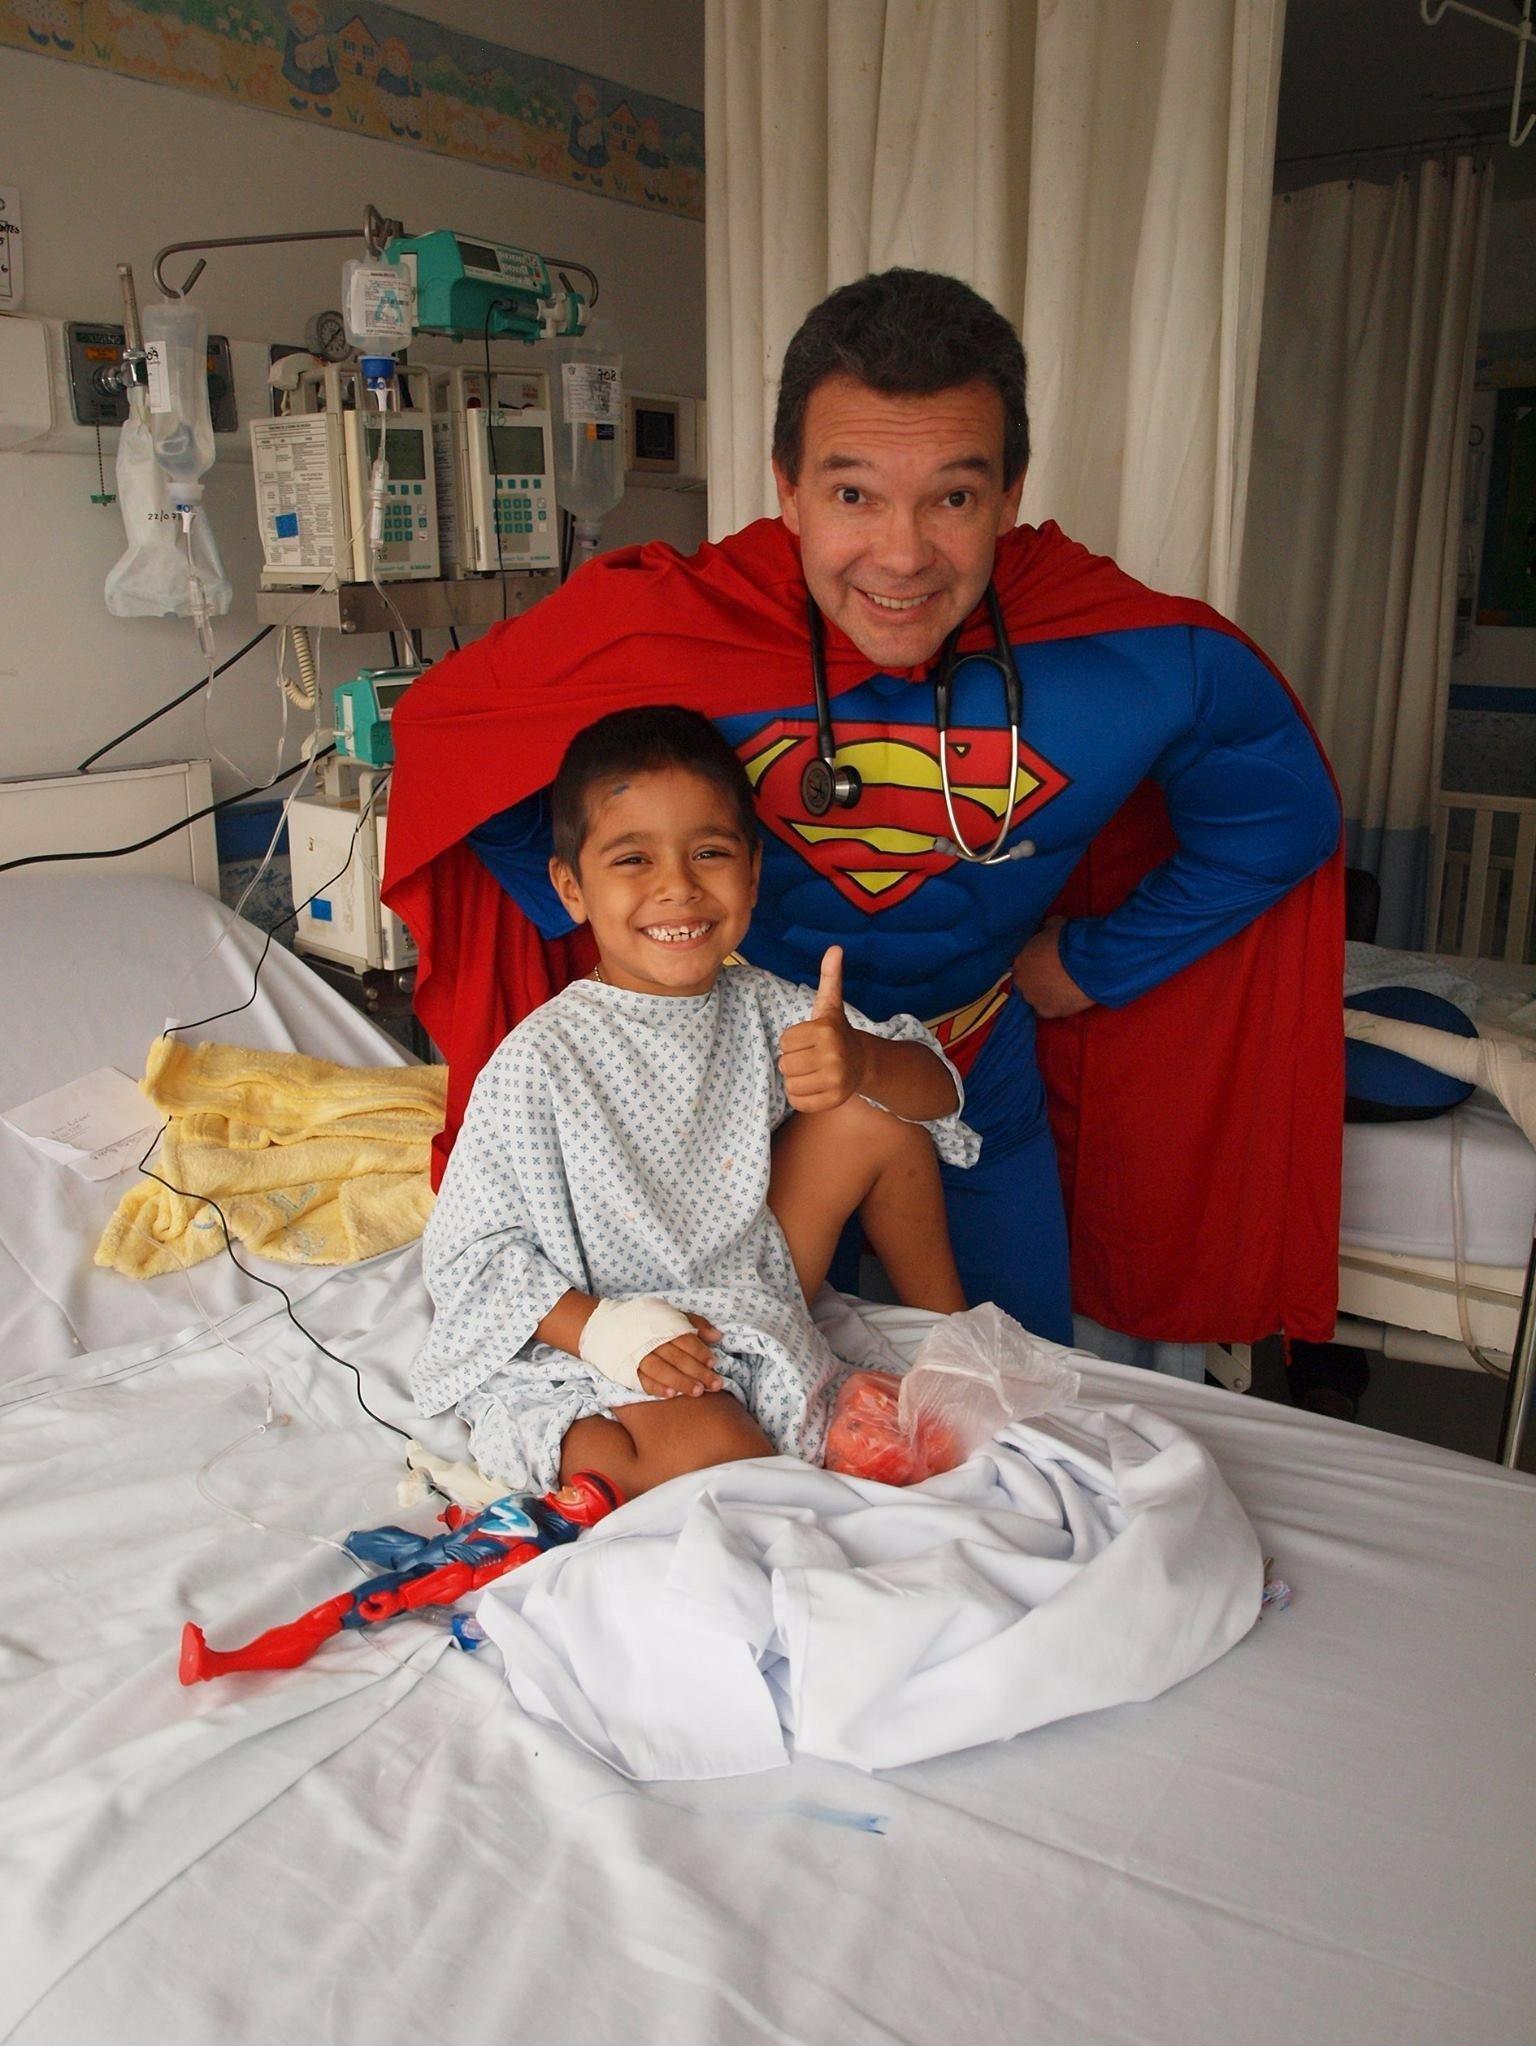 Sergio Gallegos Castorena, médecin et super-héros